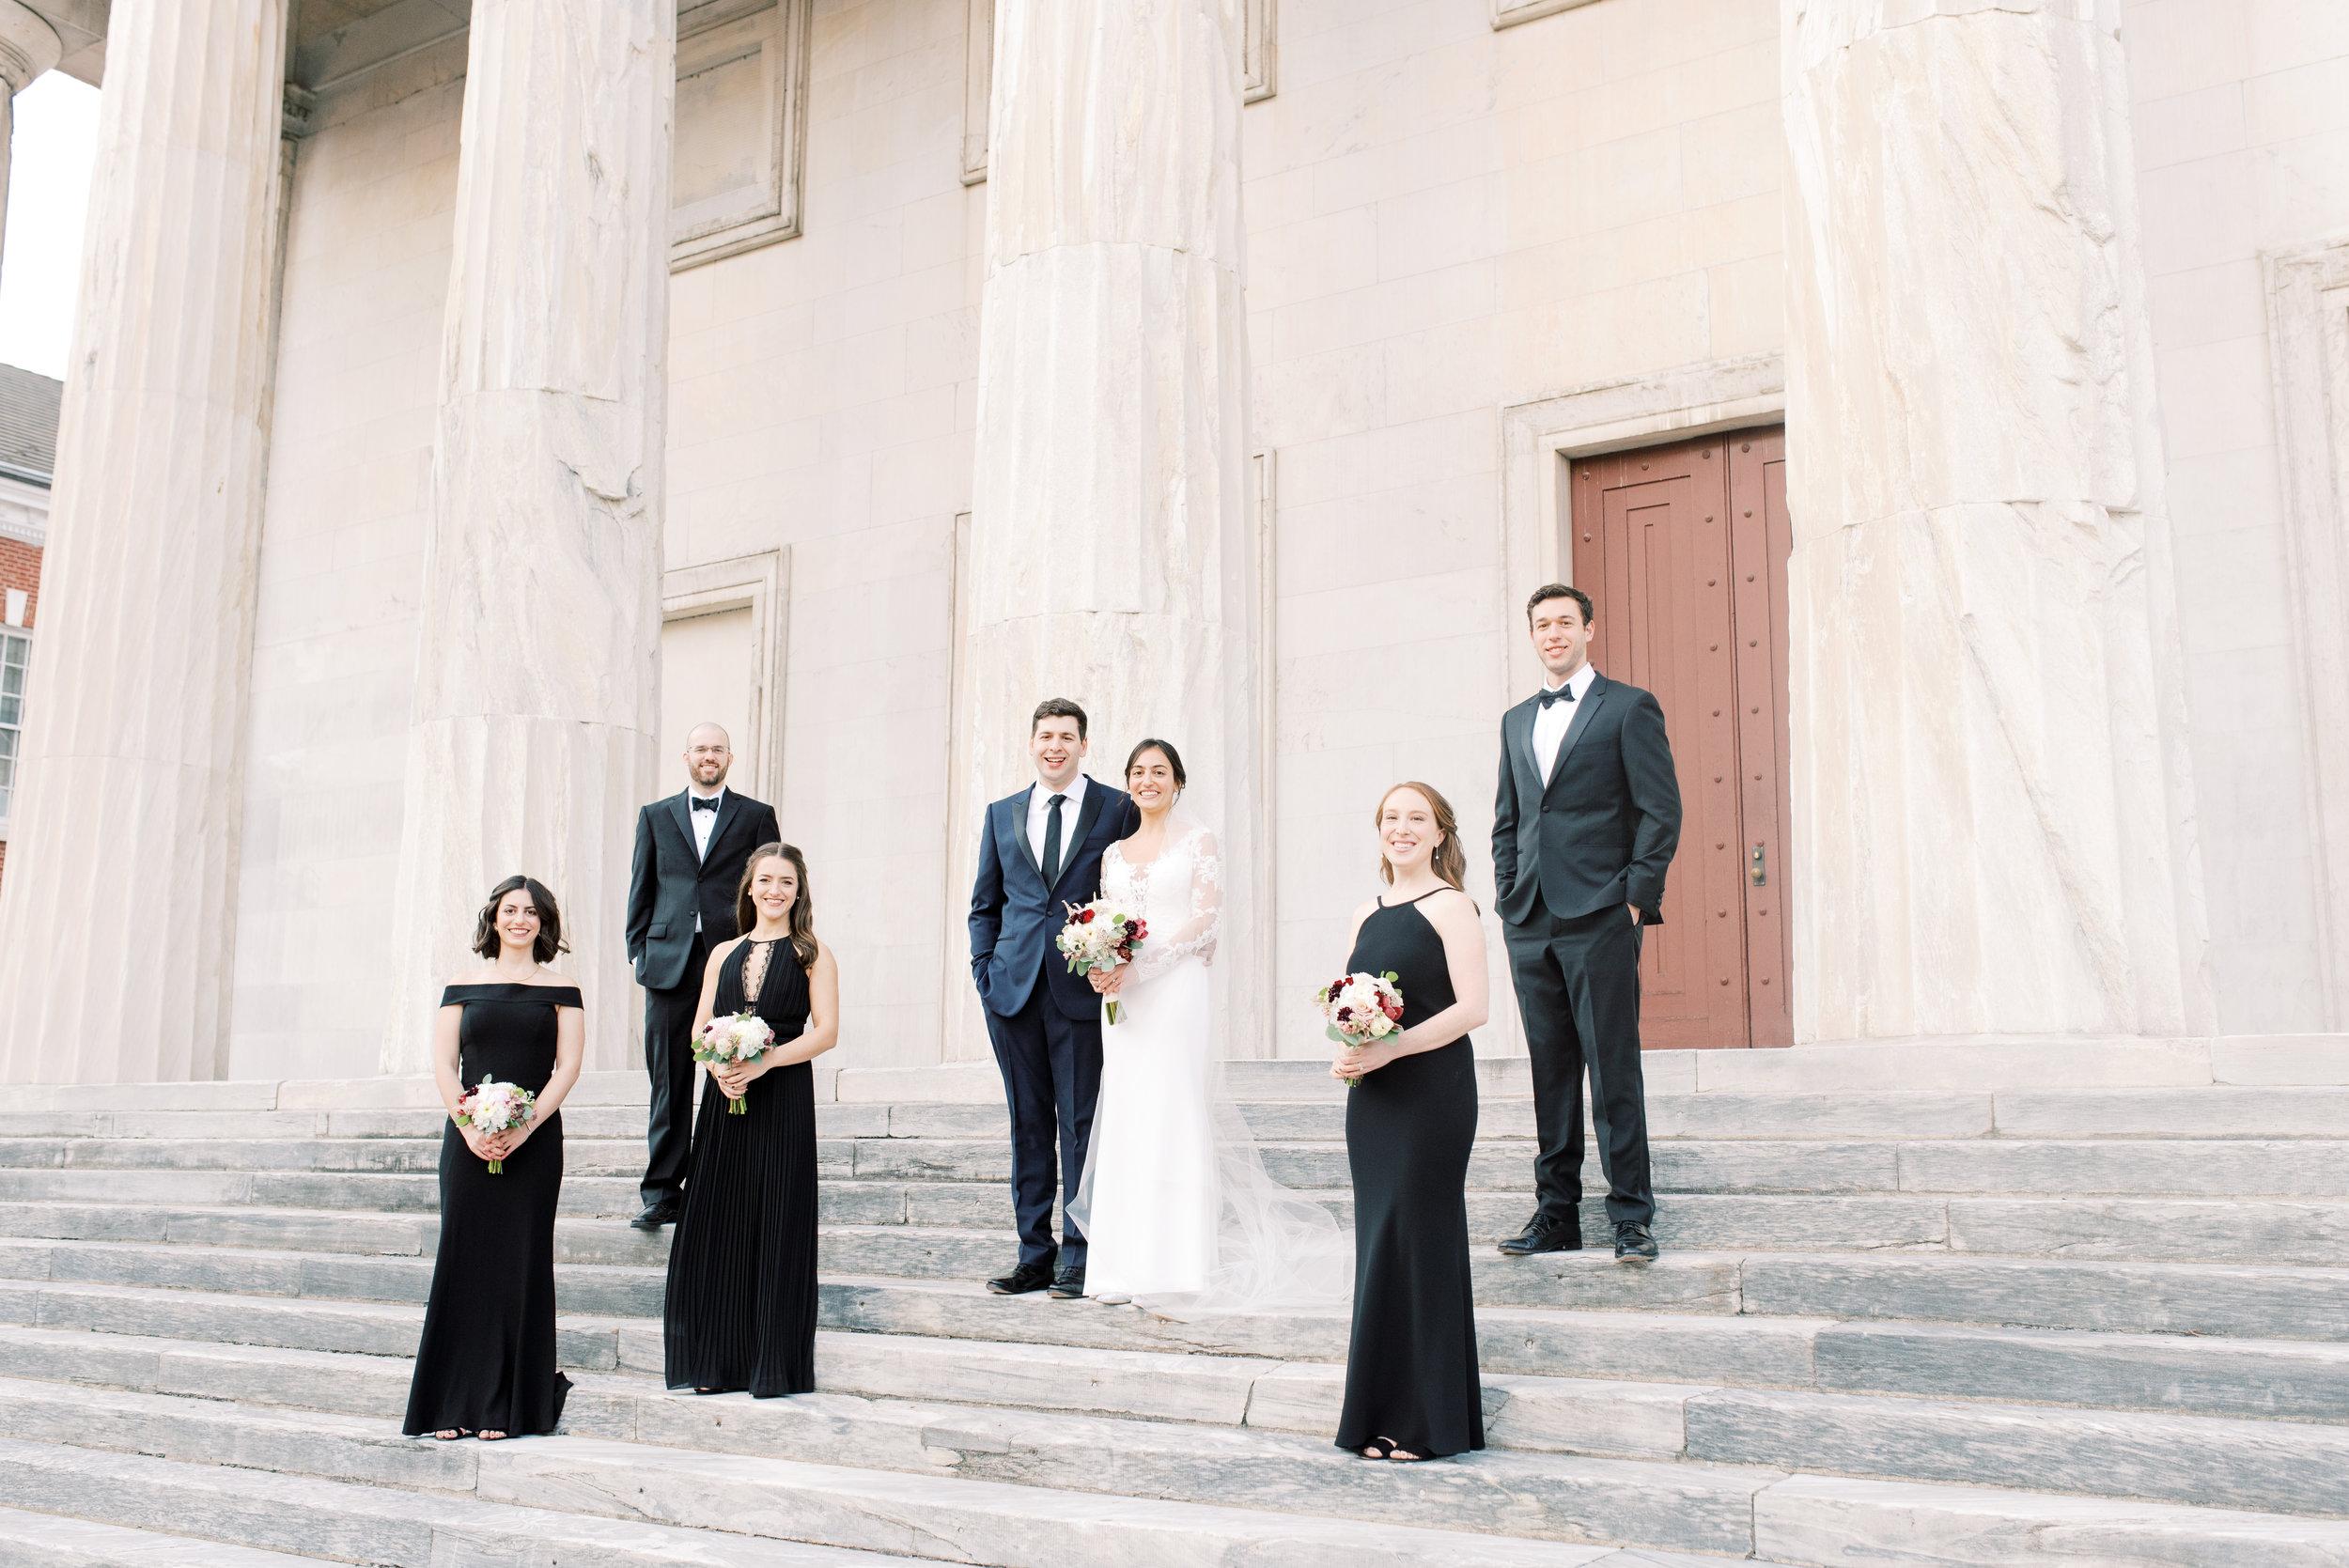 haley-richter-photography-classic-winter-union-trust-philadelphia-wedding-050.jpg